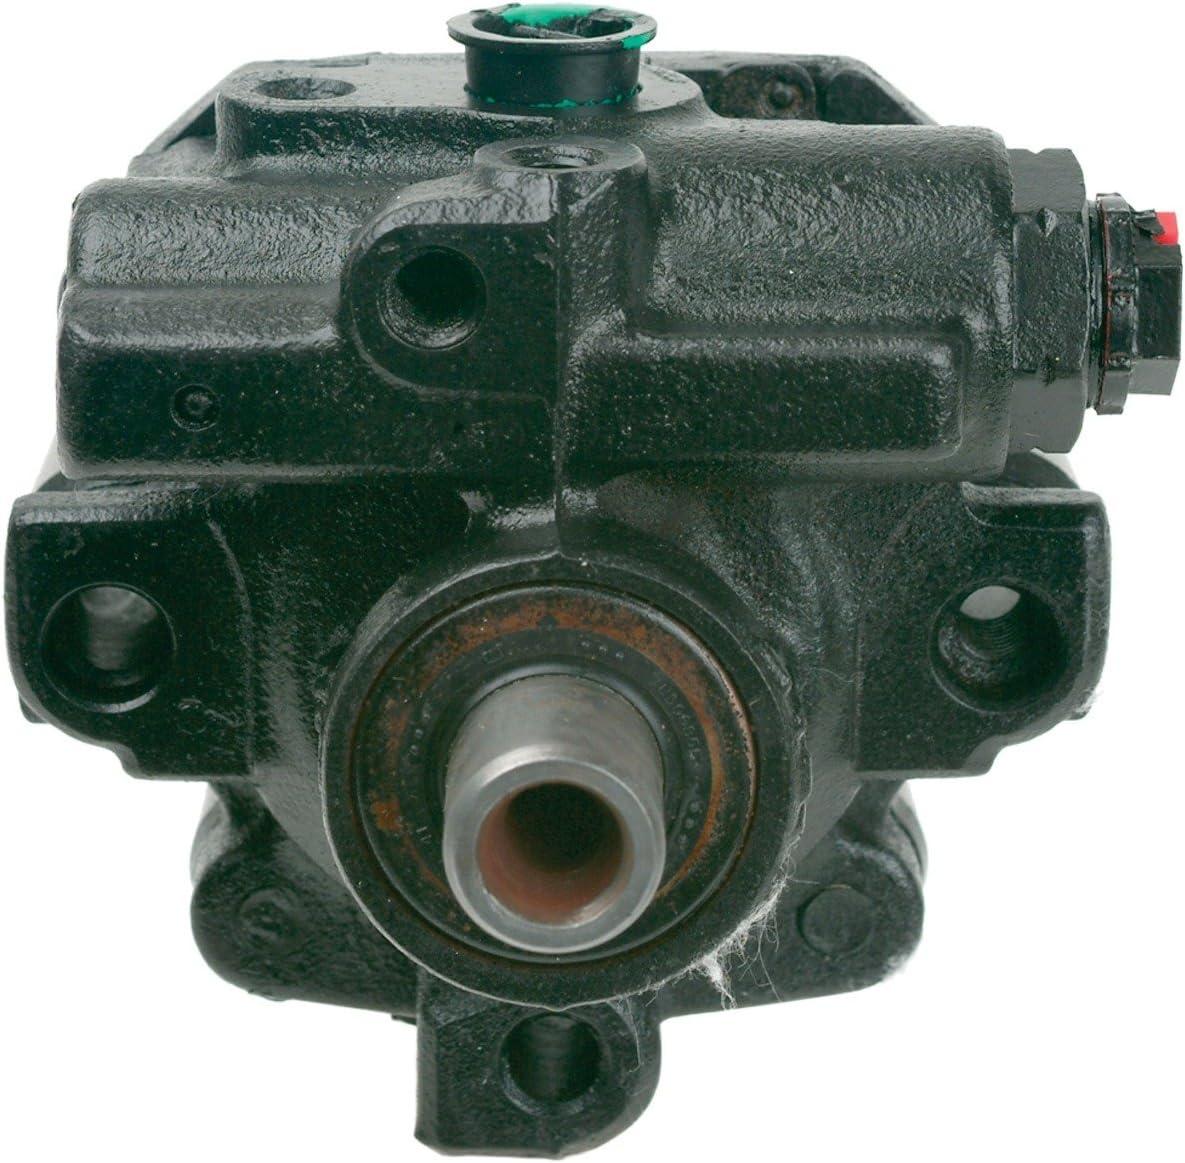 Cardone 21-5305 Remanufactured Import Power Steering Pump